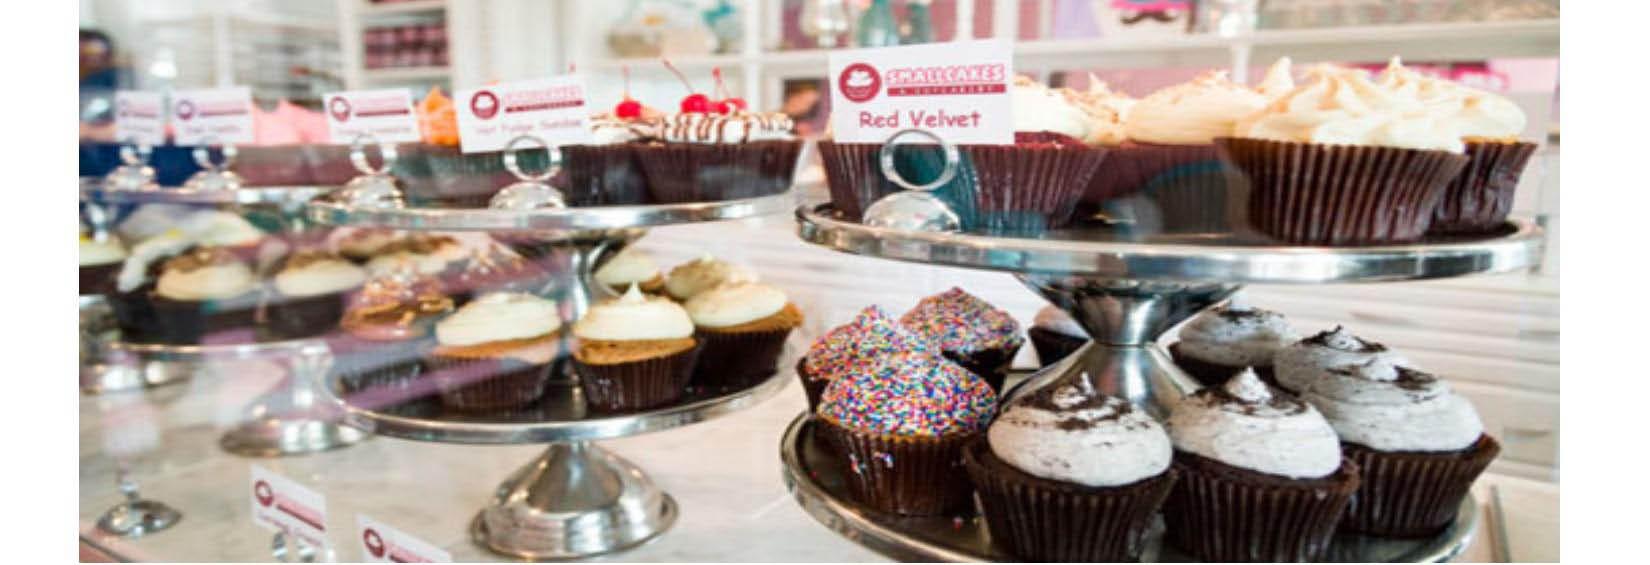 small-cakes-a-cupcakery-dallas-tx-banner